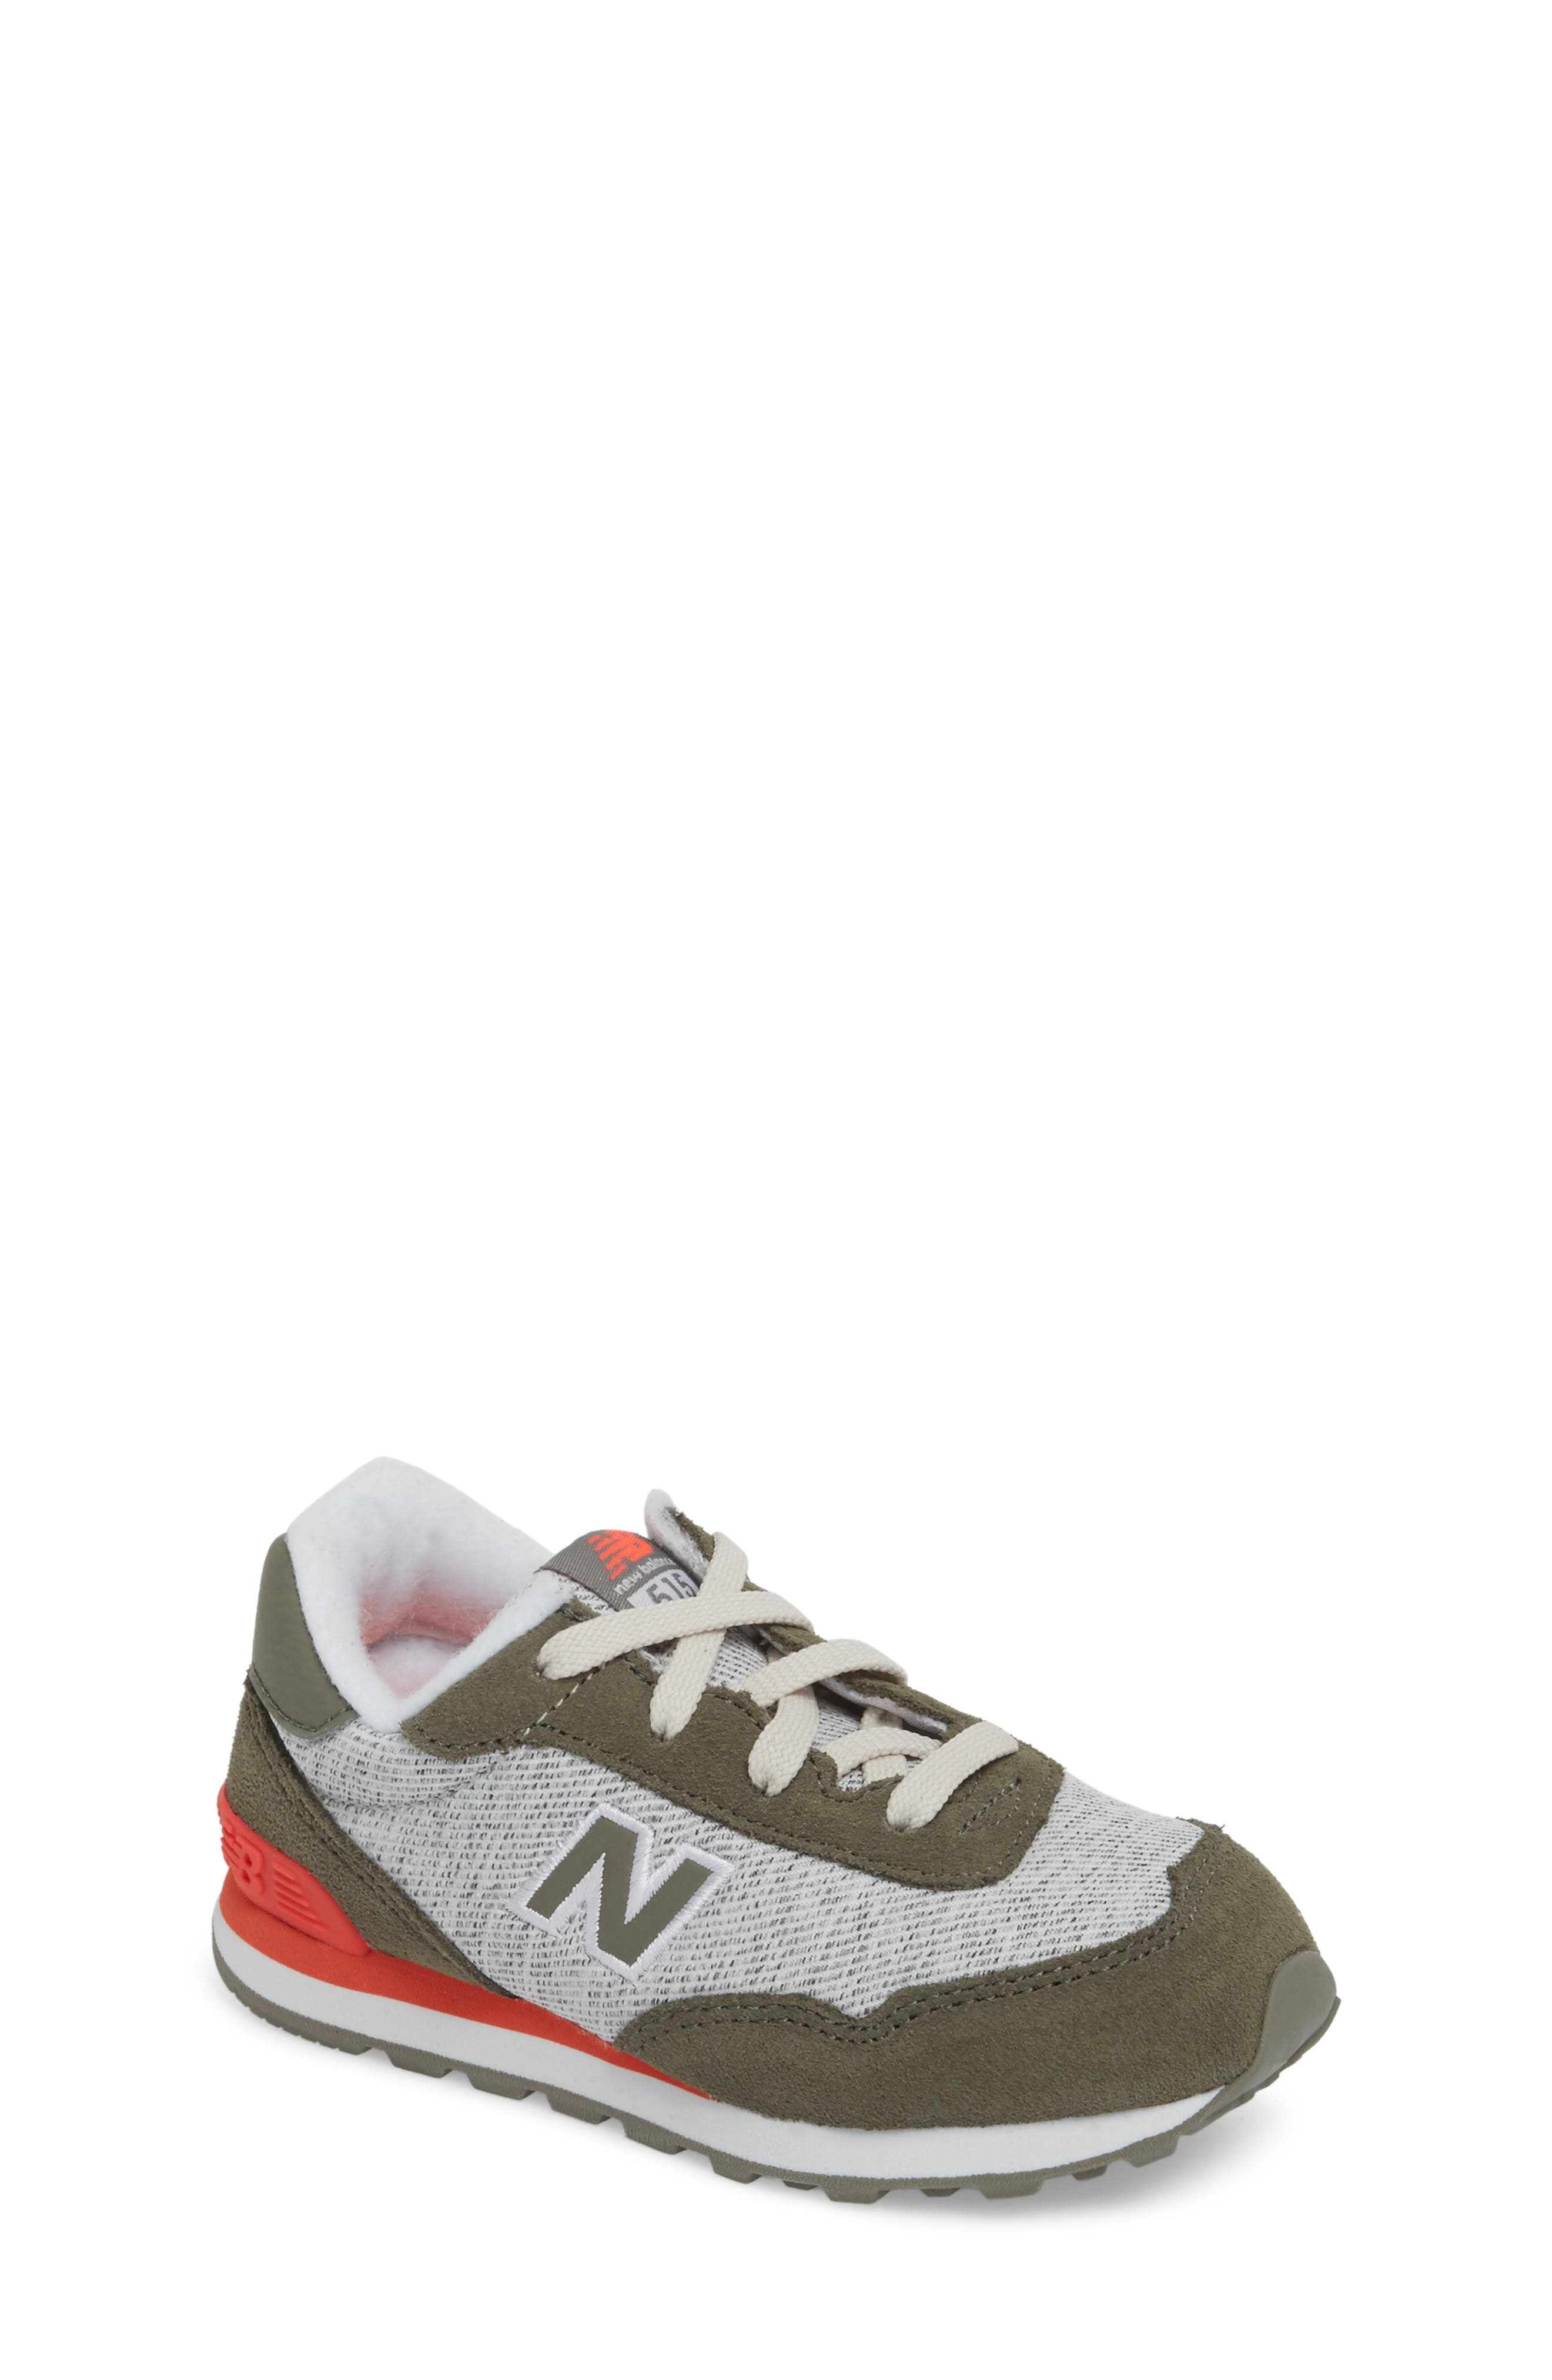 515 Sneaker,                             Main thumbnail 1, color,                             Green